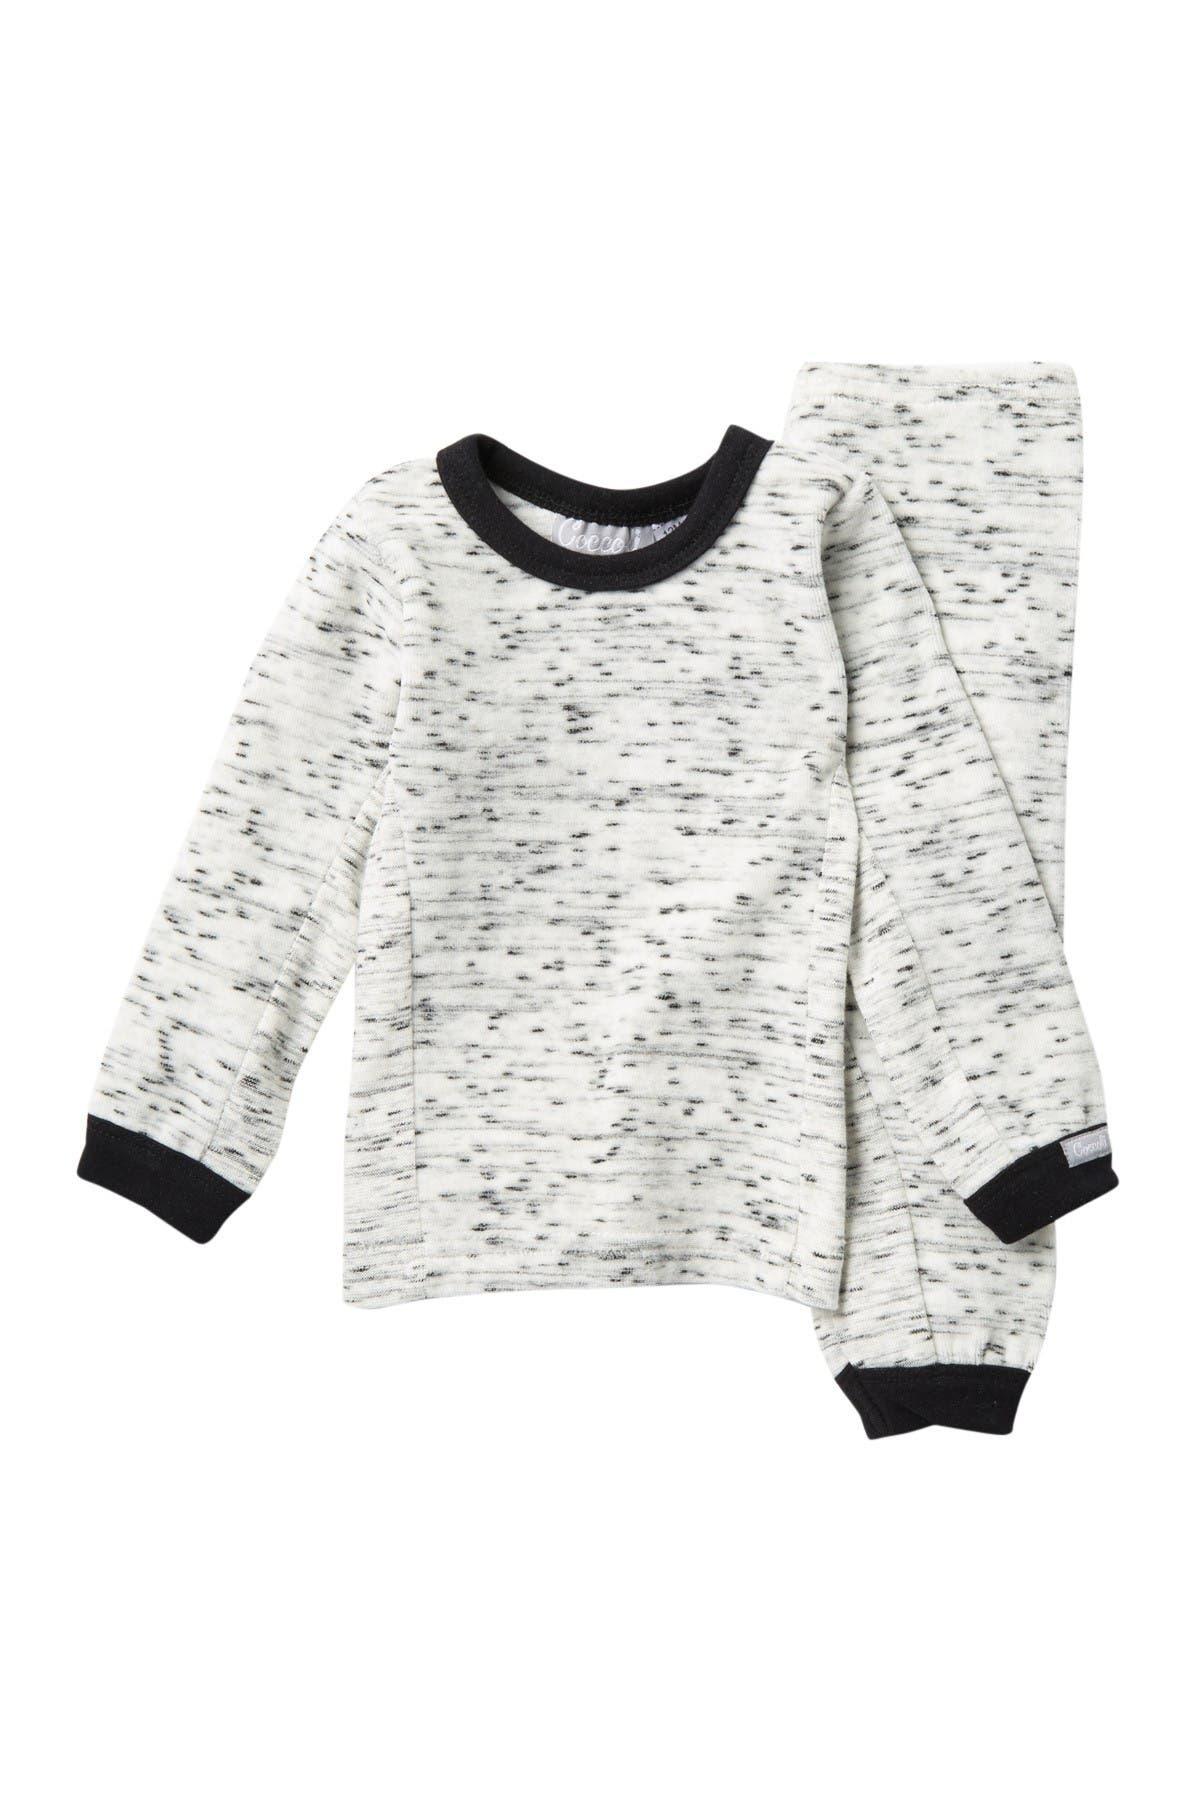 Image of Coccoli Cozy Velour Long Sleeve Top & Pants Pajama Set